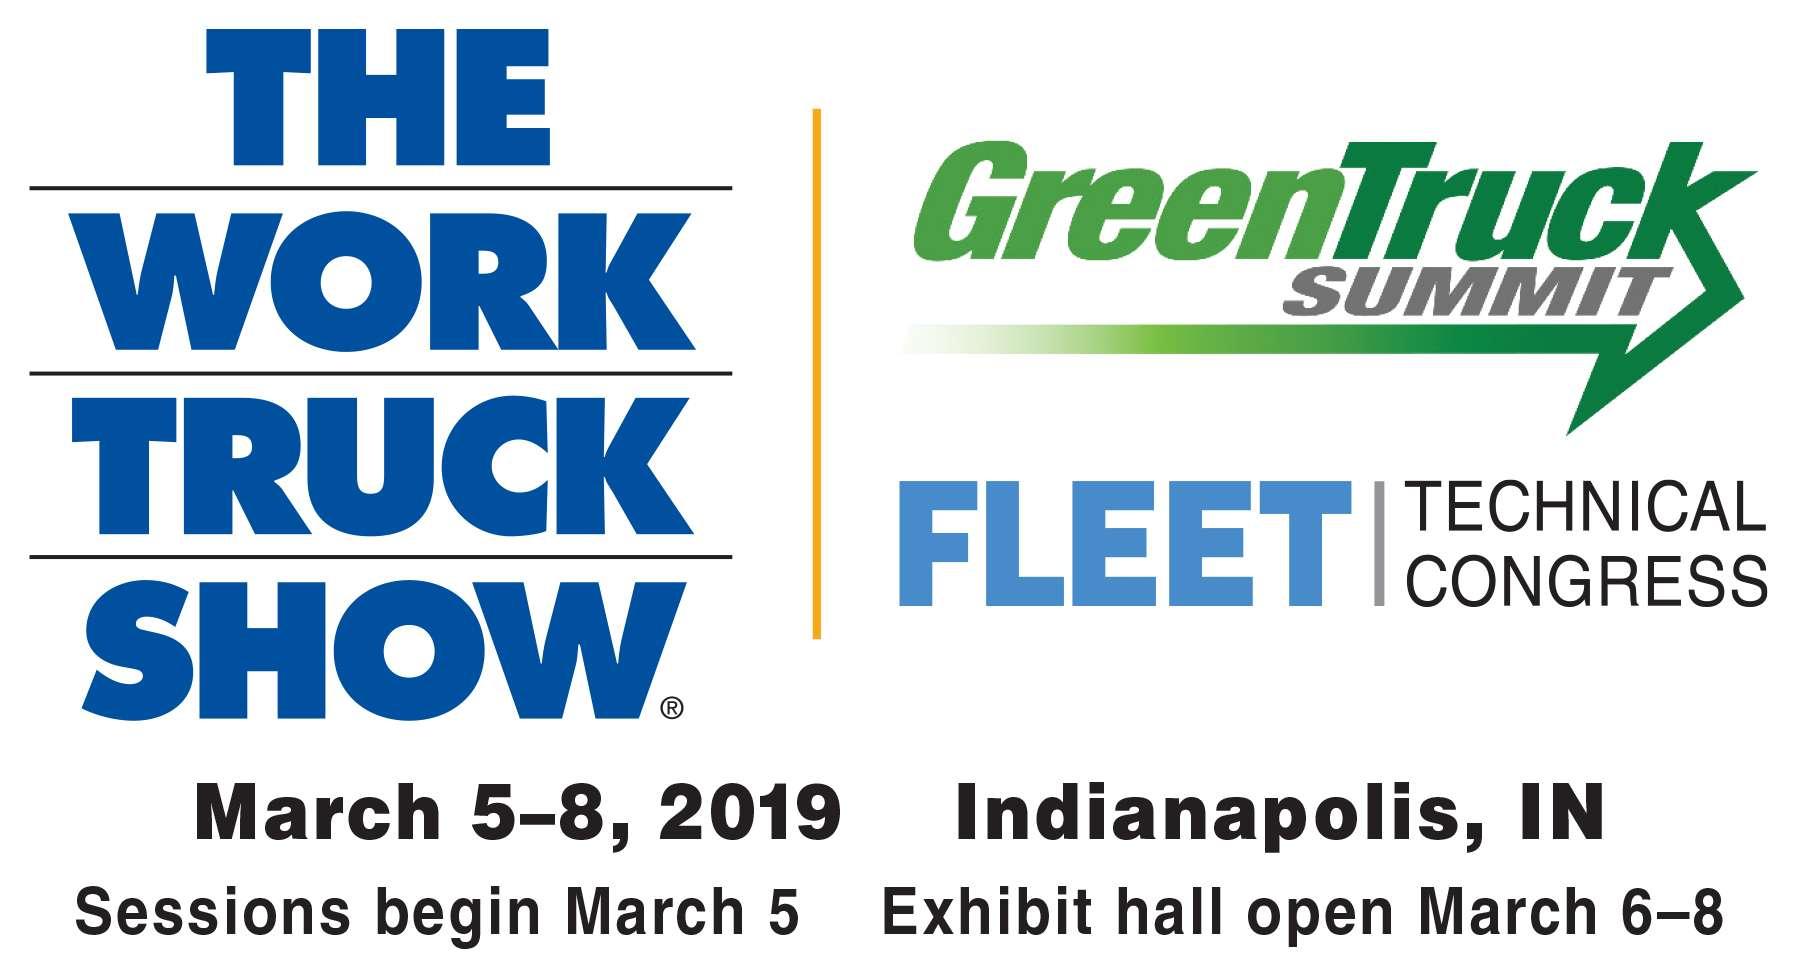 work truck show logo 2019